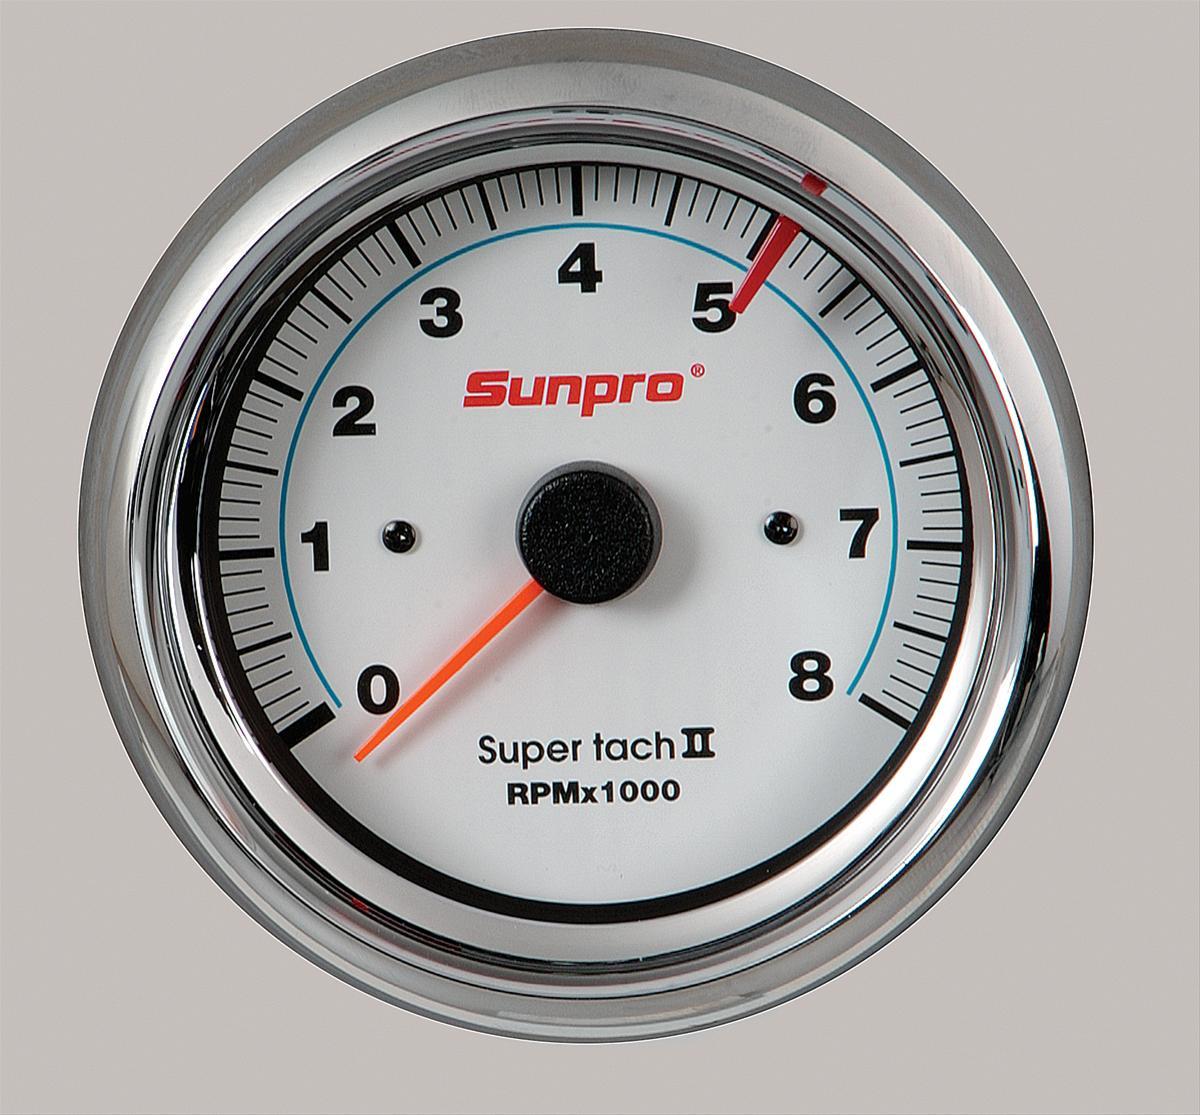 sunpro super tach 3 wiring diagram goodman air handler keeps running sun ii tachometers cp7903 free